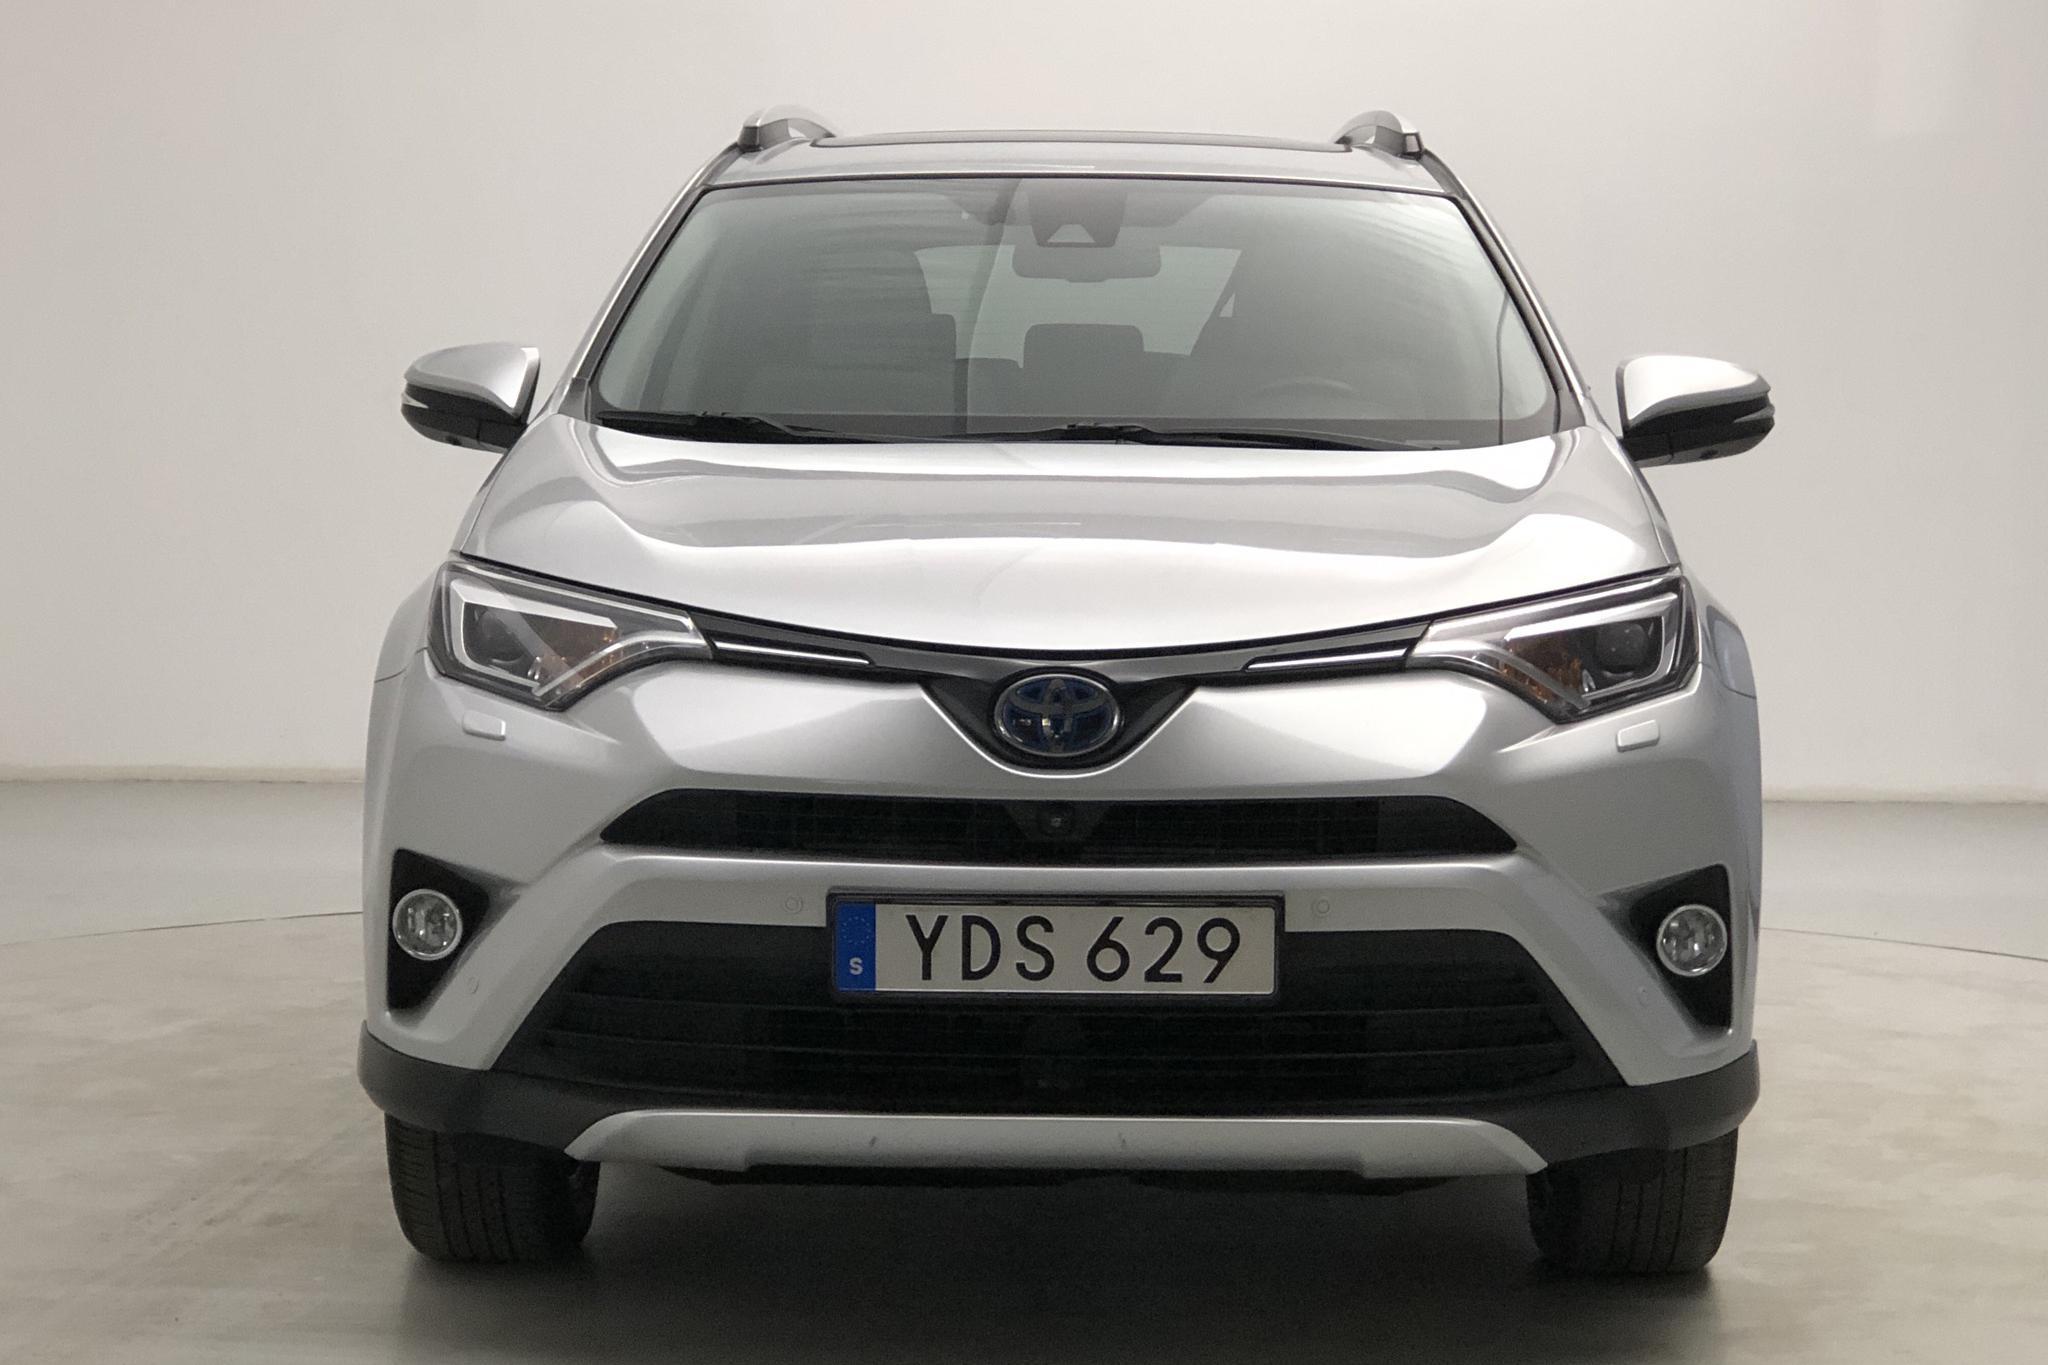 Toyota RAV4 2.5 HSD AWD (197hk) - 10 479 mil - Automat - silver - 2016